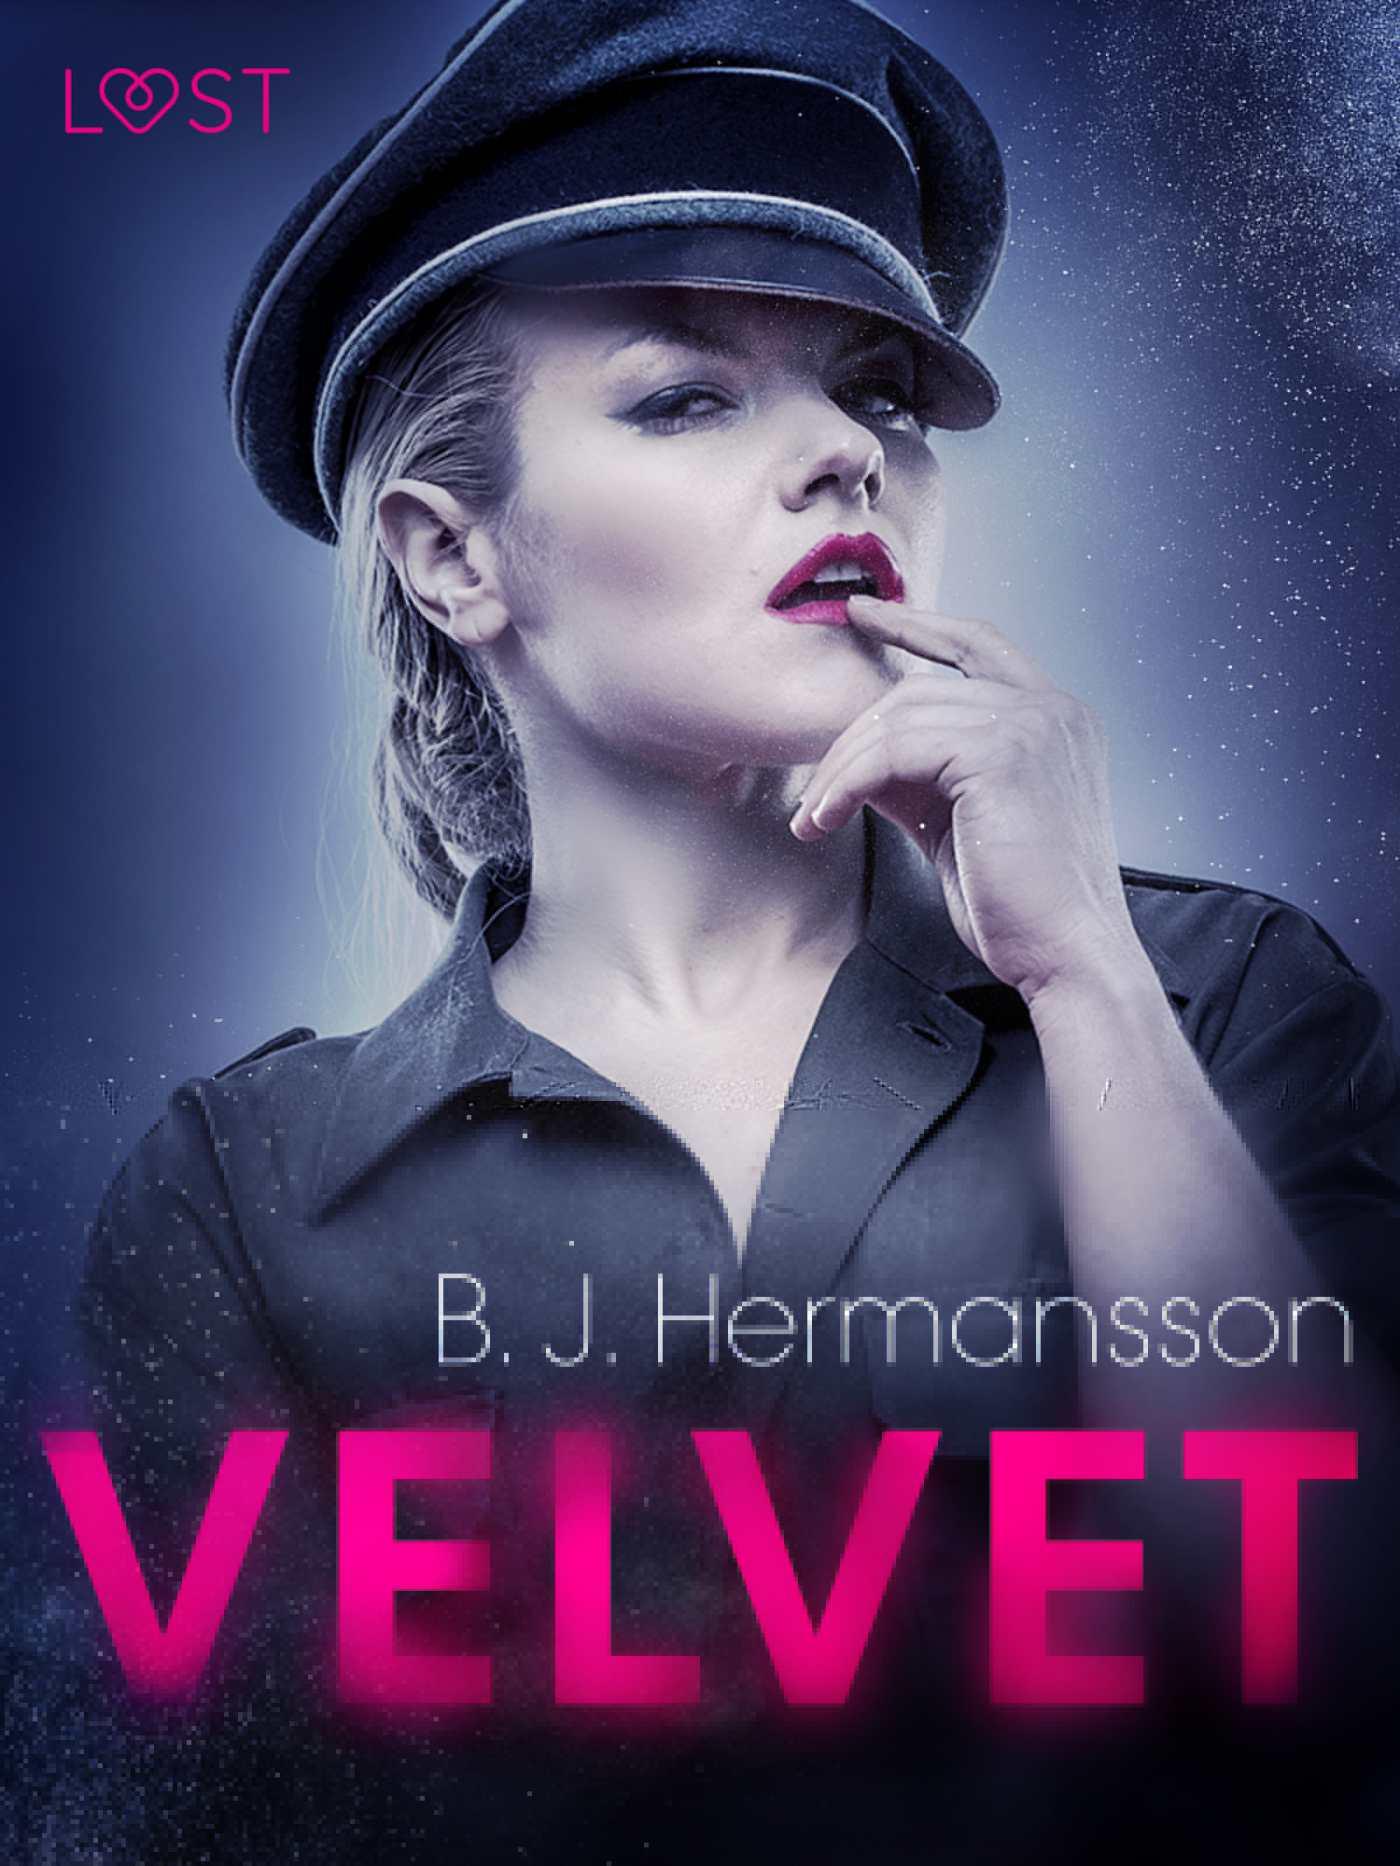 Velvet - Ebook (Książka EPUB) do pobrania w formacie EPUB